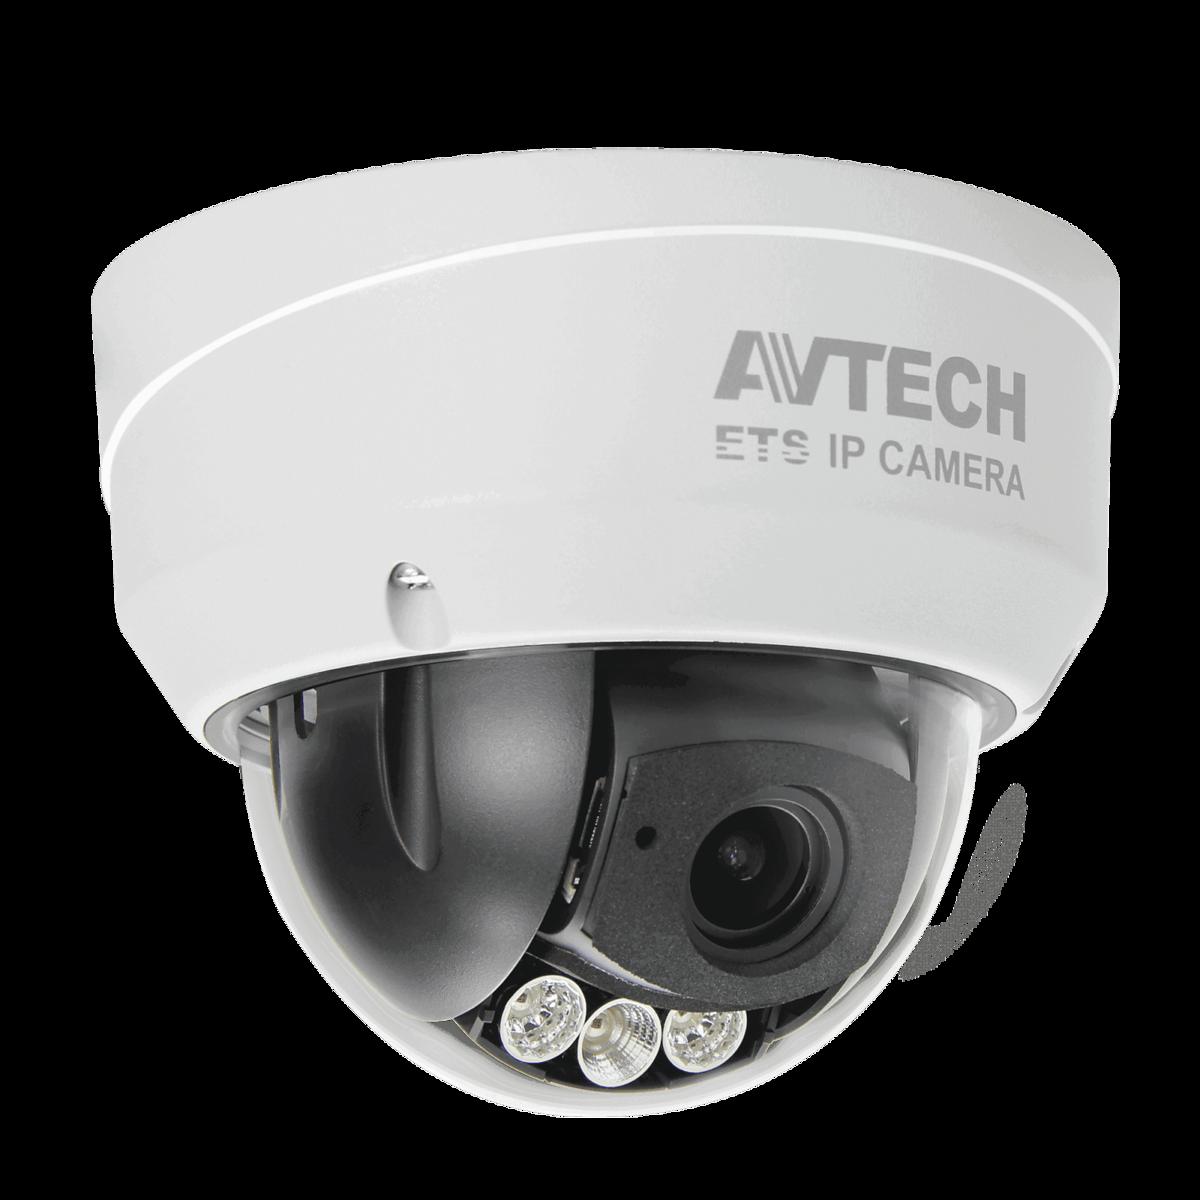 AVTECH AVM542 - Vandalsäker IP-kamera med Full HD